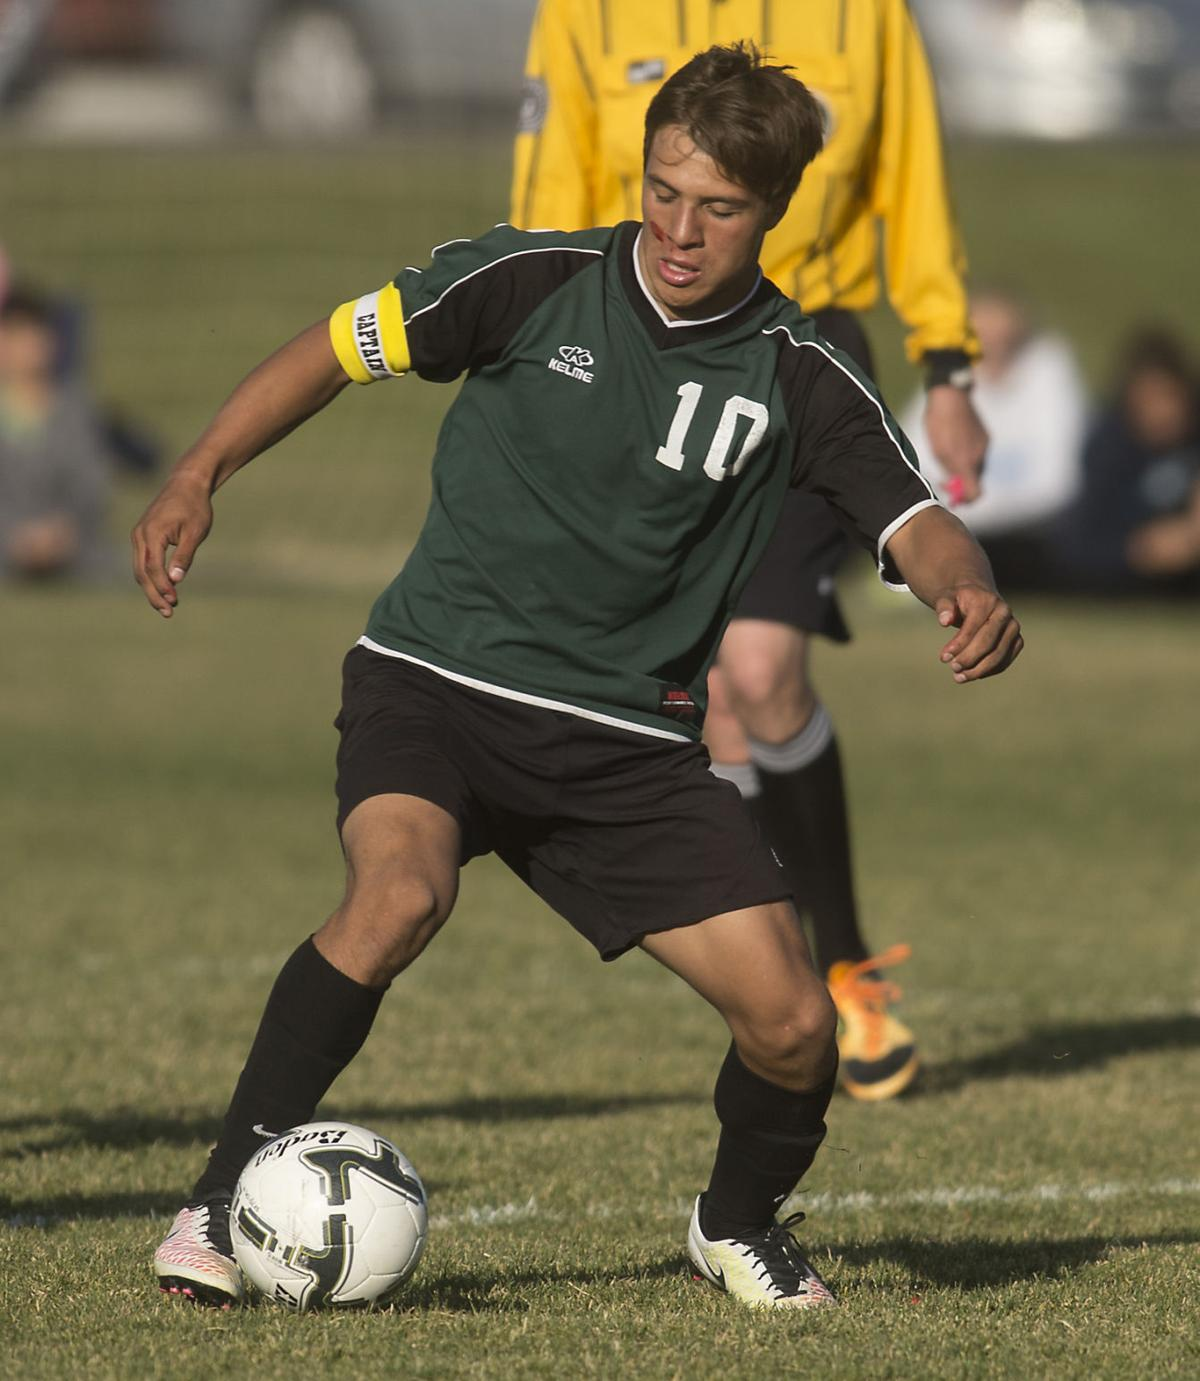 Boys Soccer - Burley Vs. Canyon Ridge